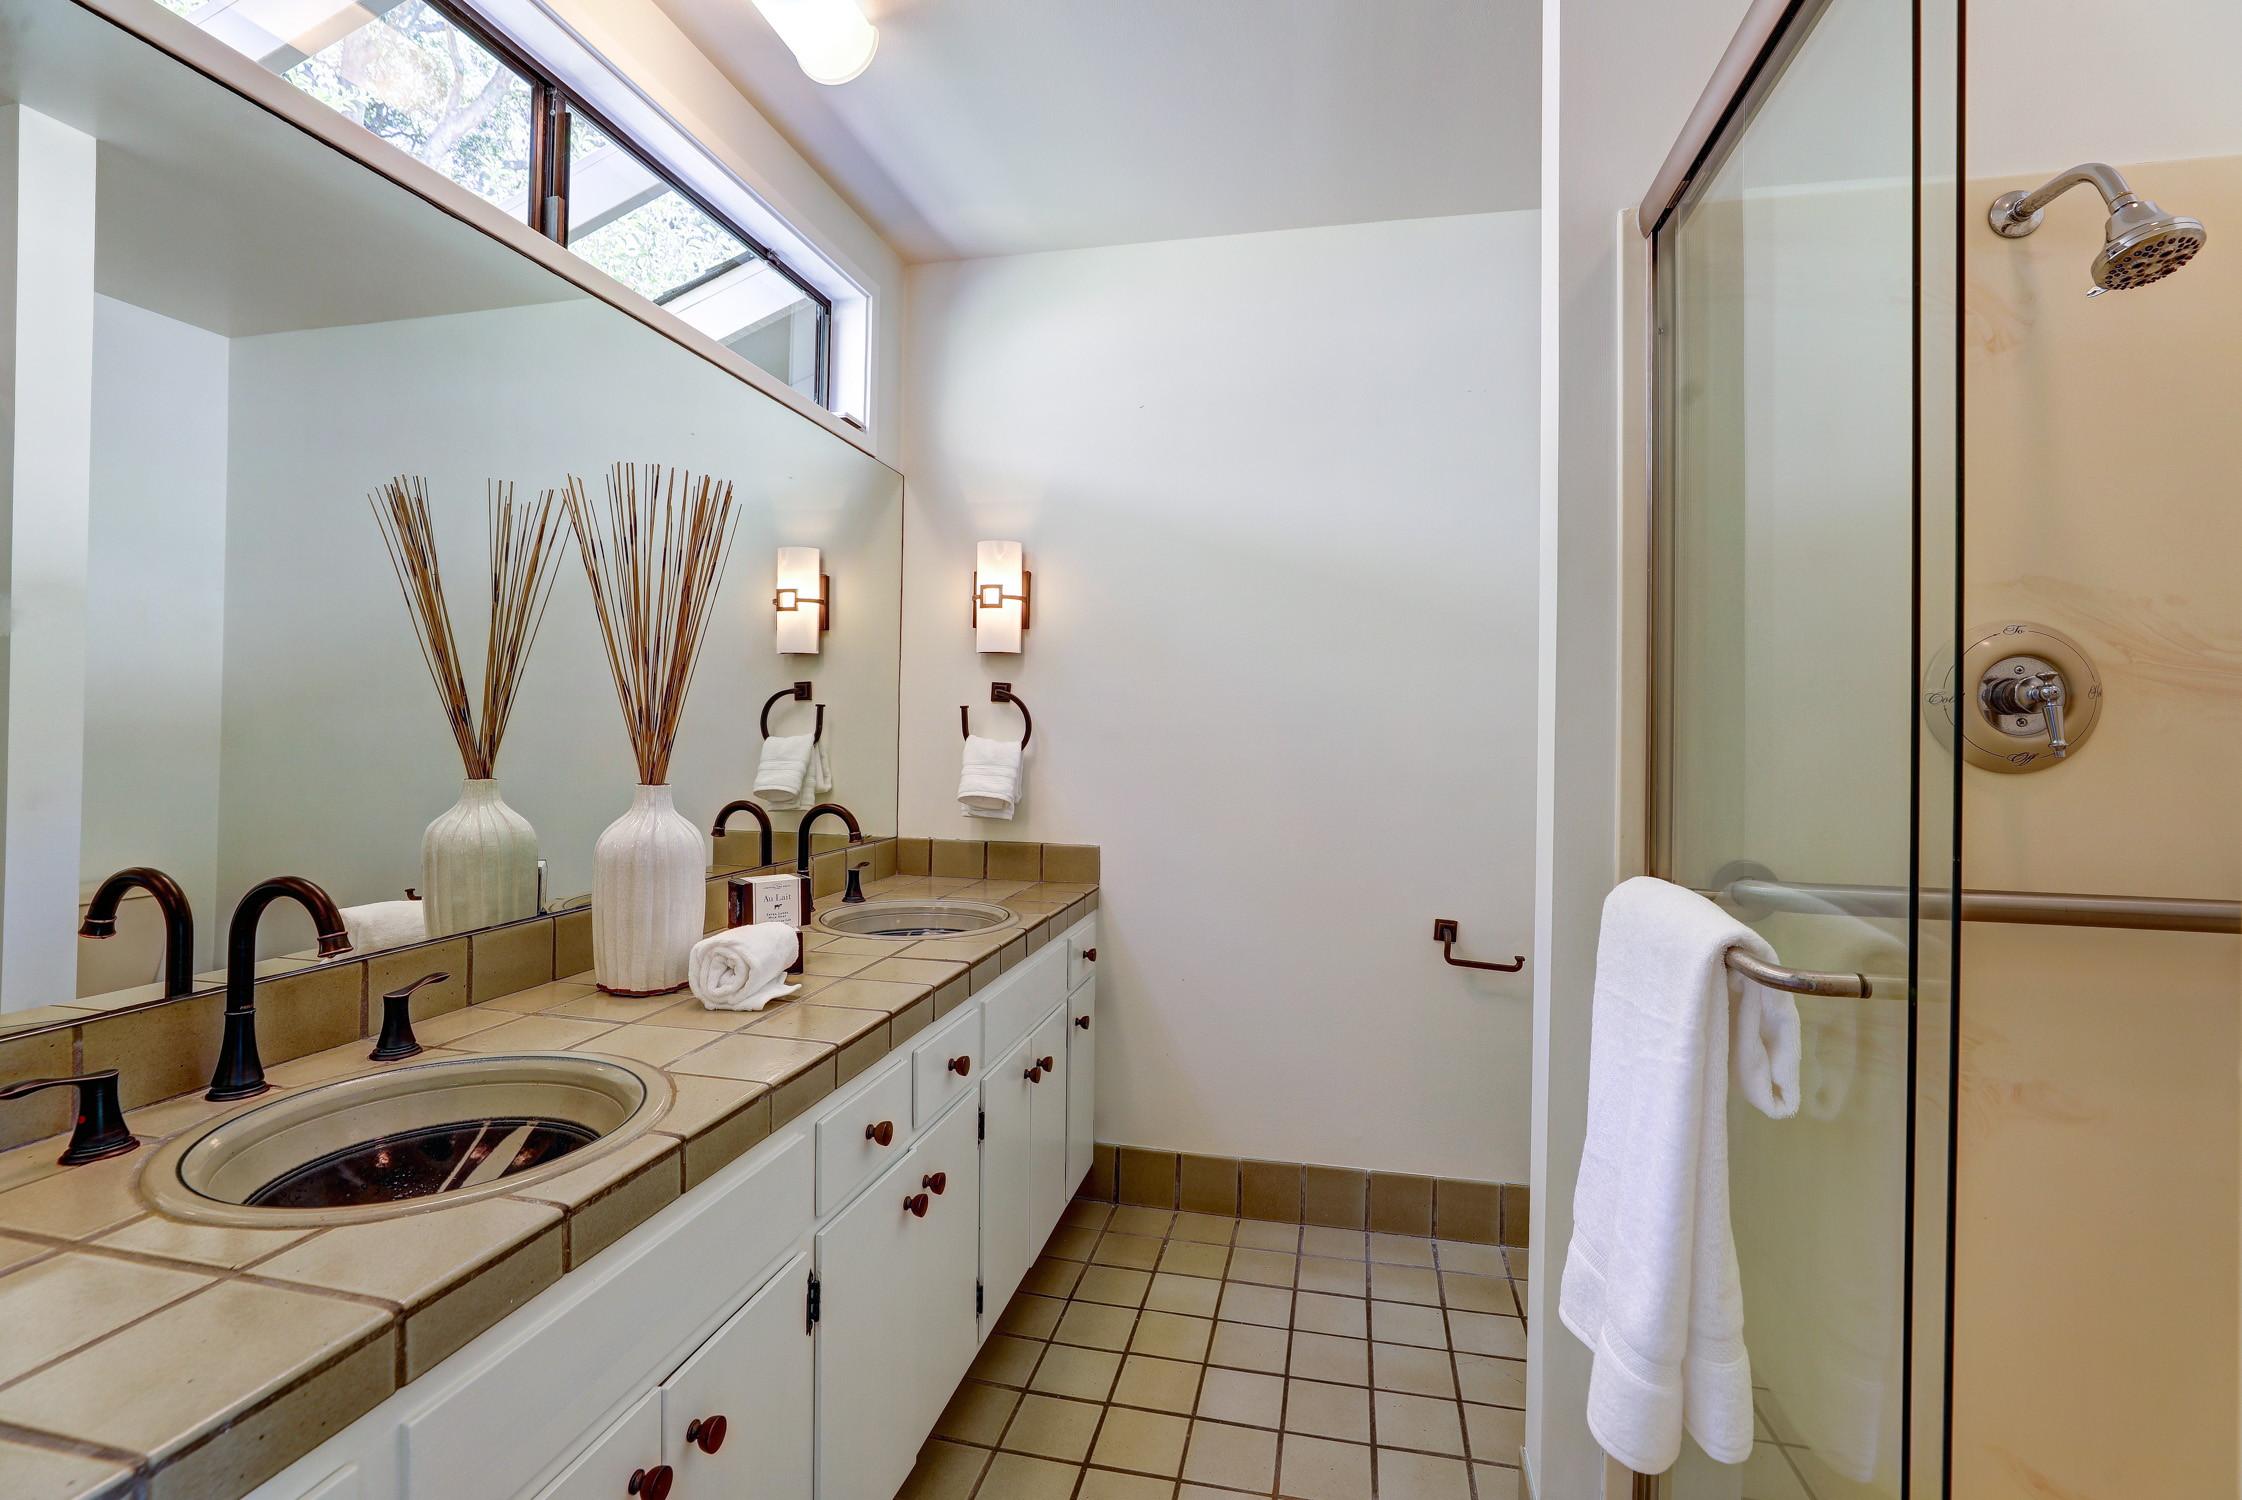 16Dorian 40 MLSSan Rafael Real Estate - Listed by Julia Fitzpatrick + Allie Fornesi Team Own Marin County .jpg